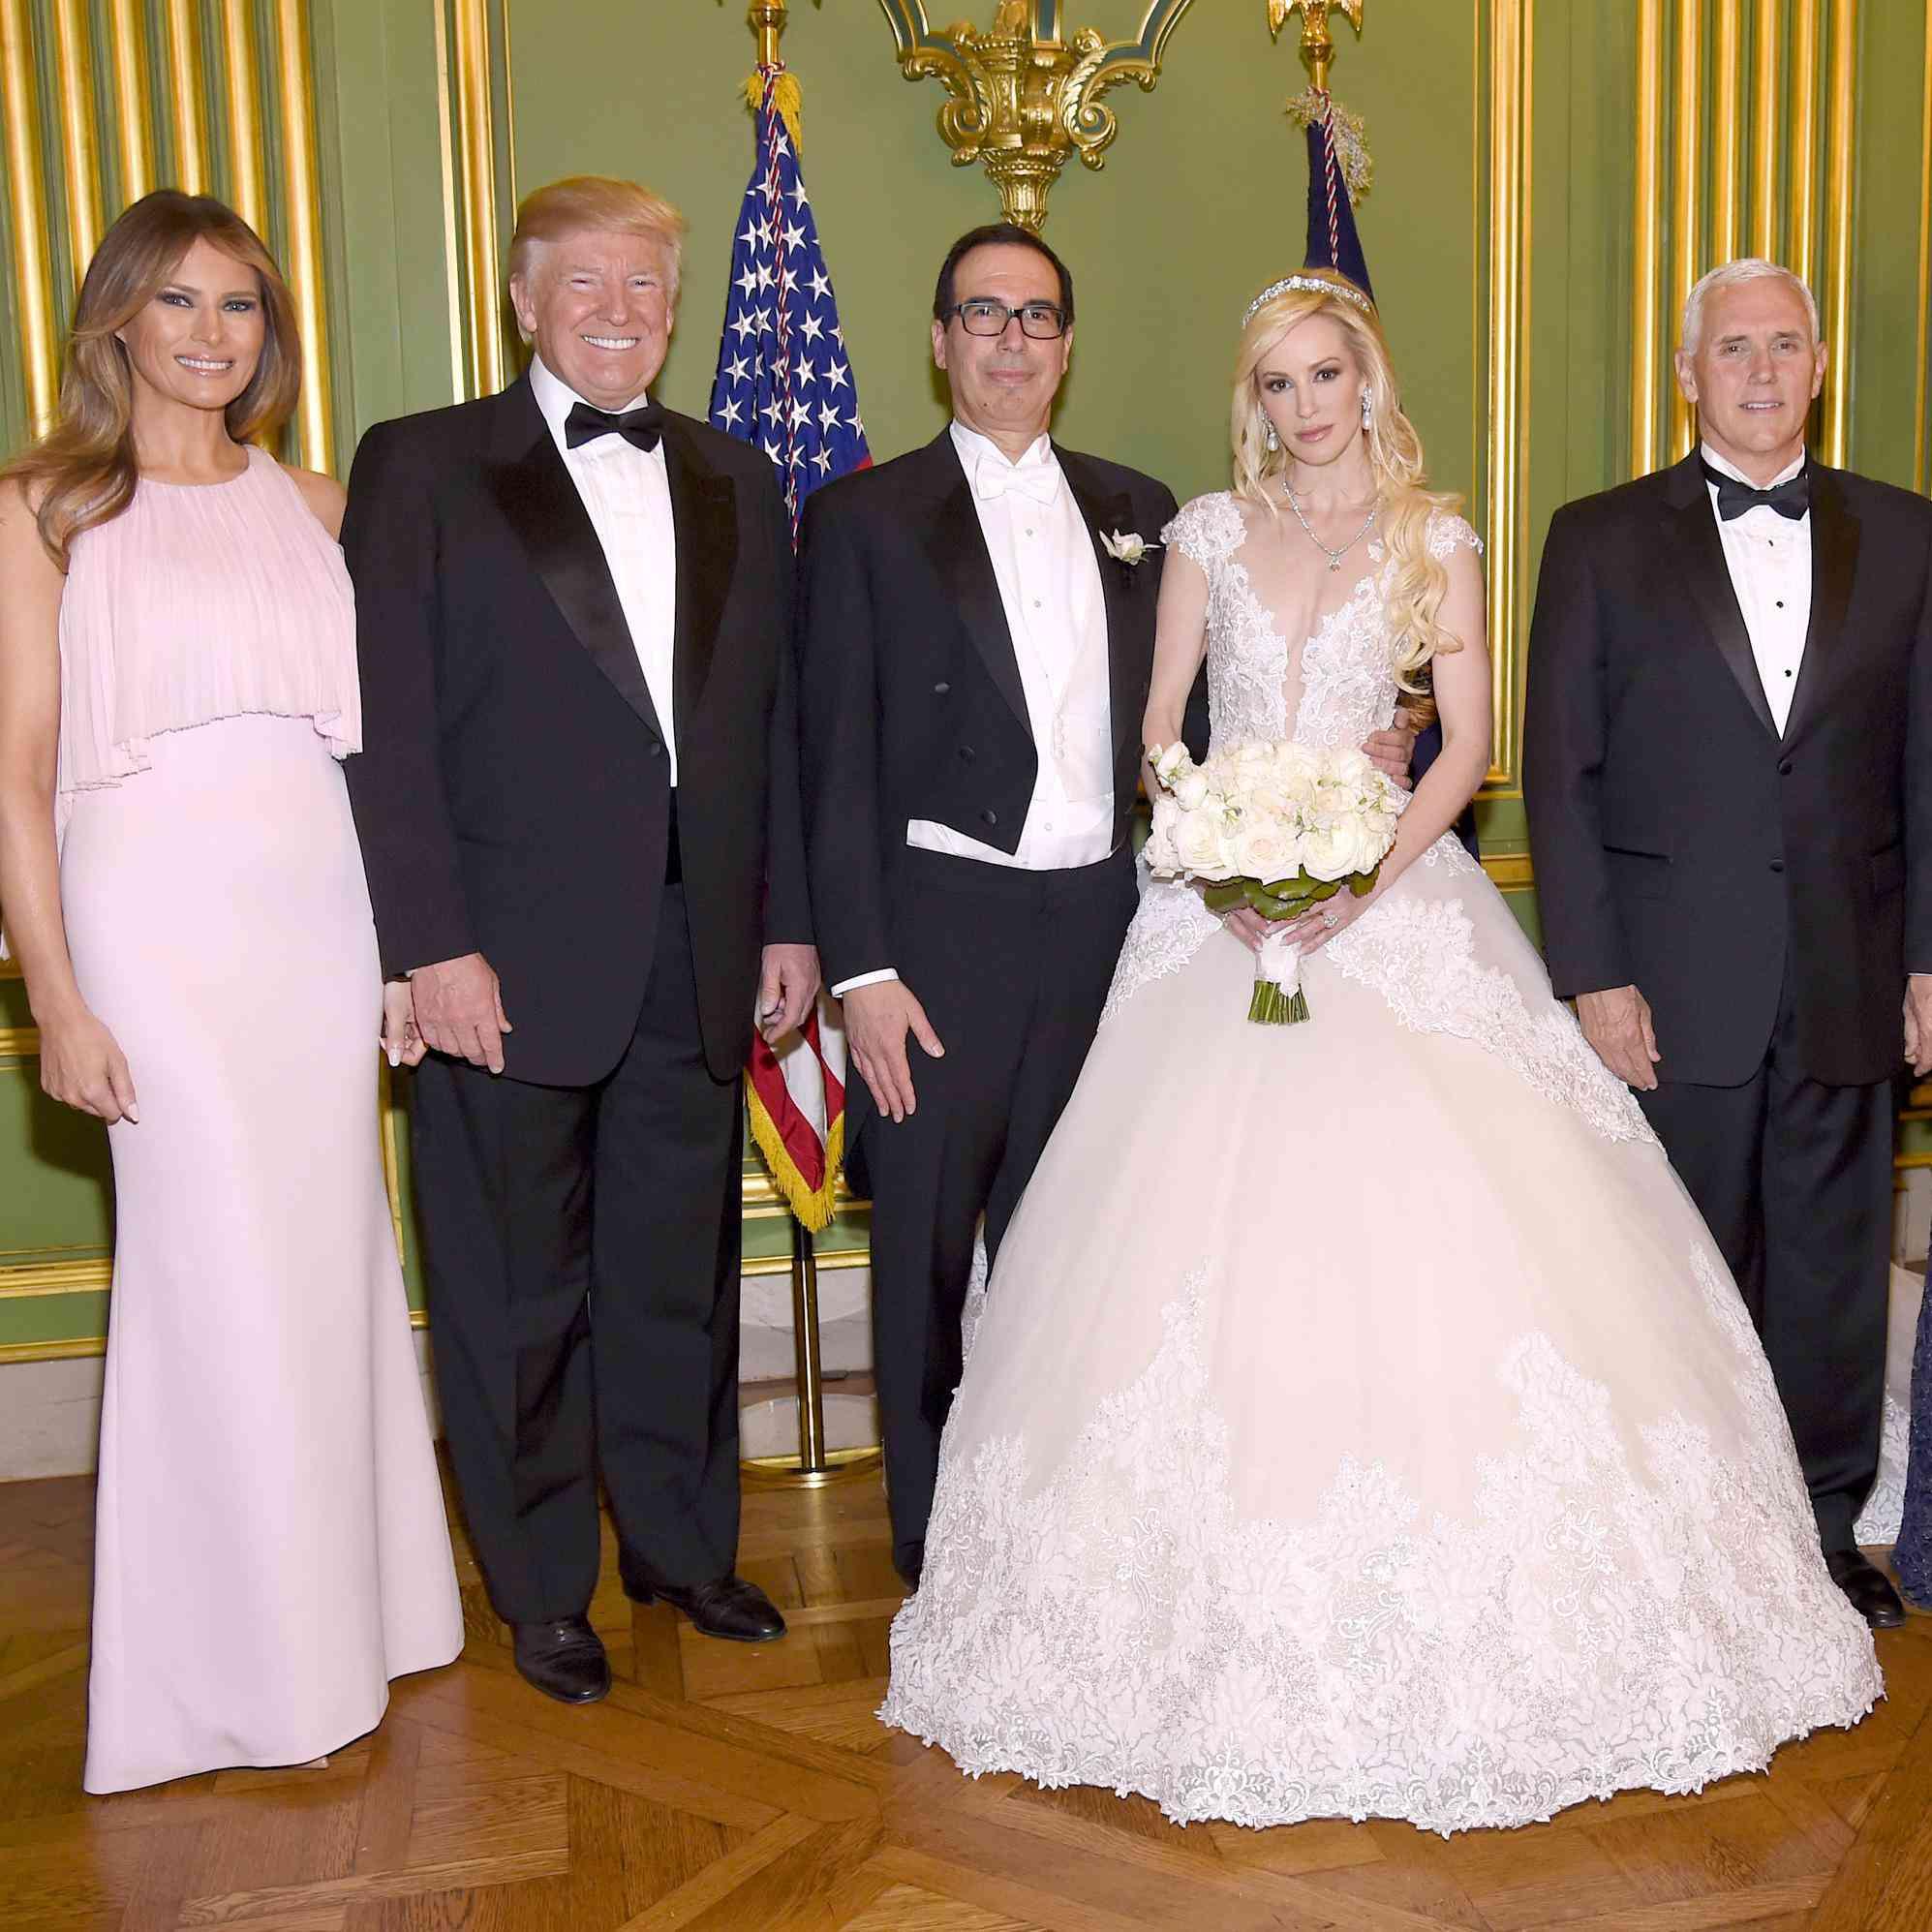 Trump And Melania Wedding.Donald Trump And Melania Attended Treasury Secretary Steven